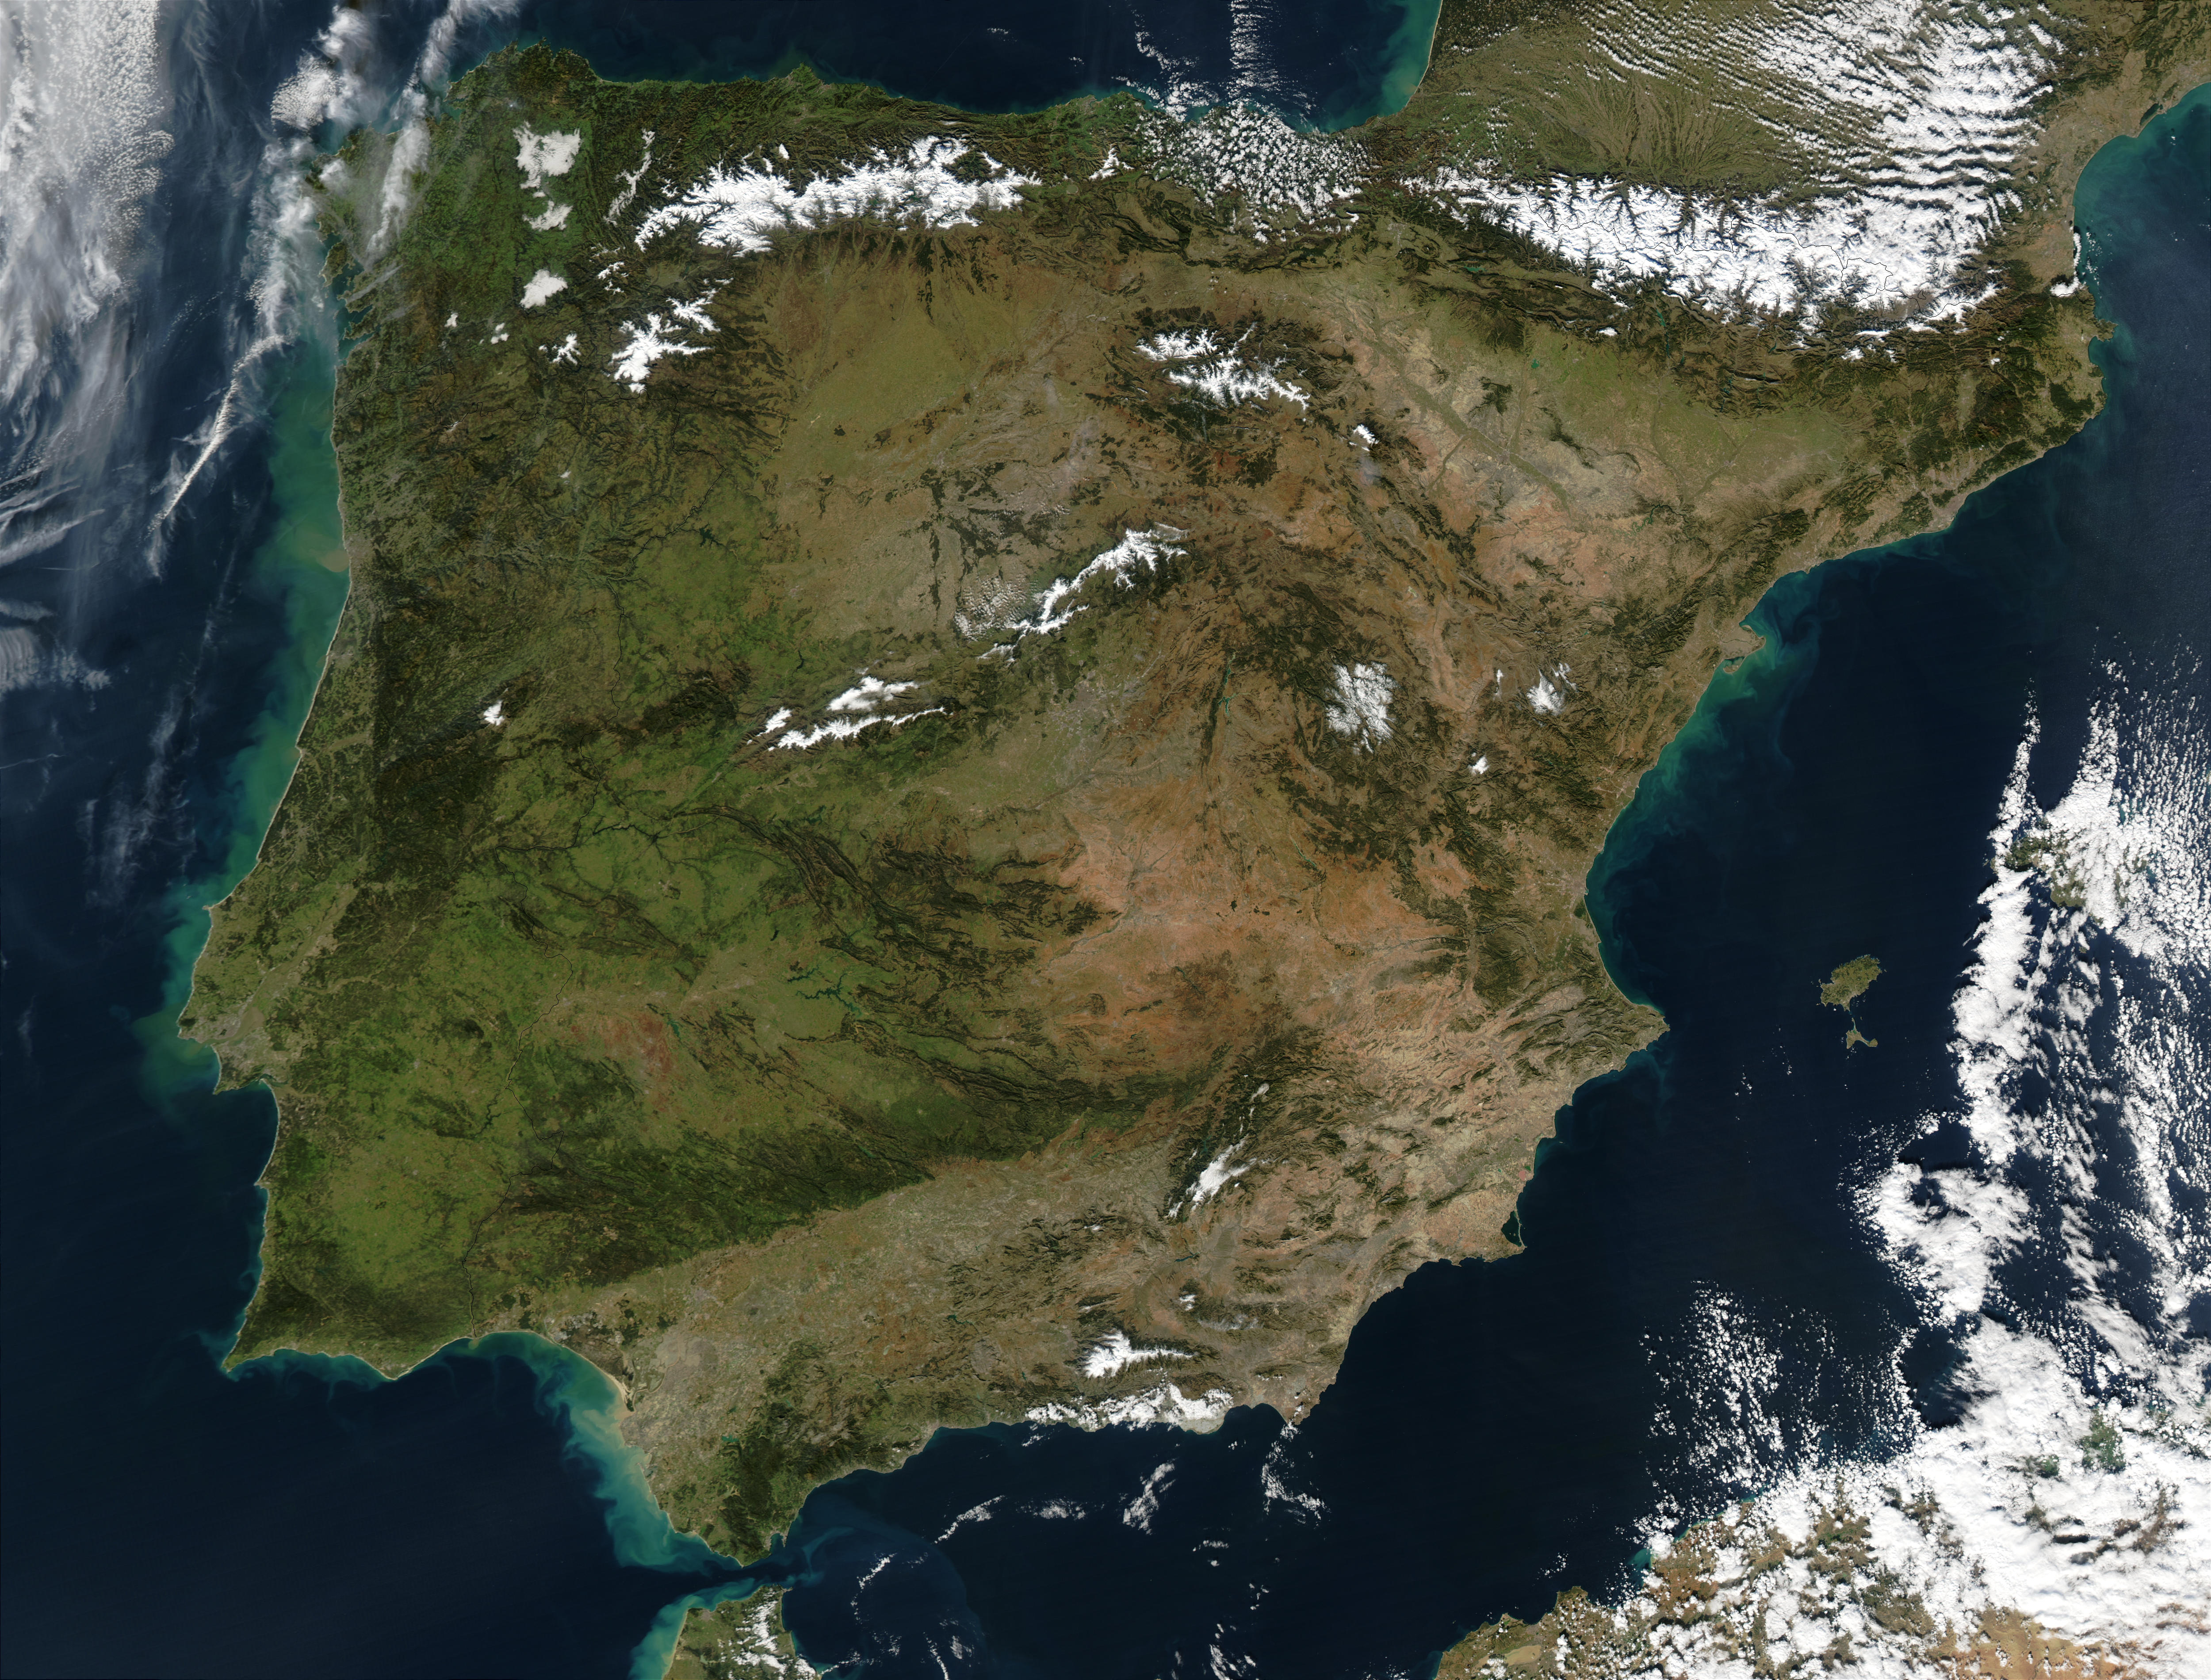 Mapa Satelital De España.Mapa Satelital De Espana Mapa Owje Com